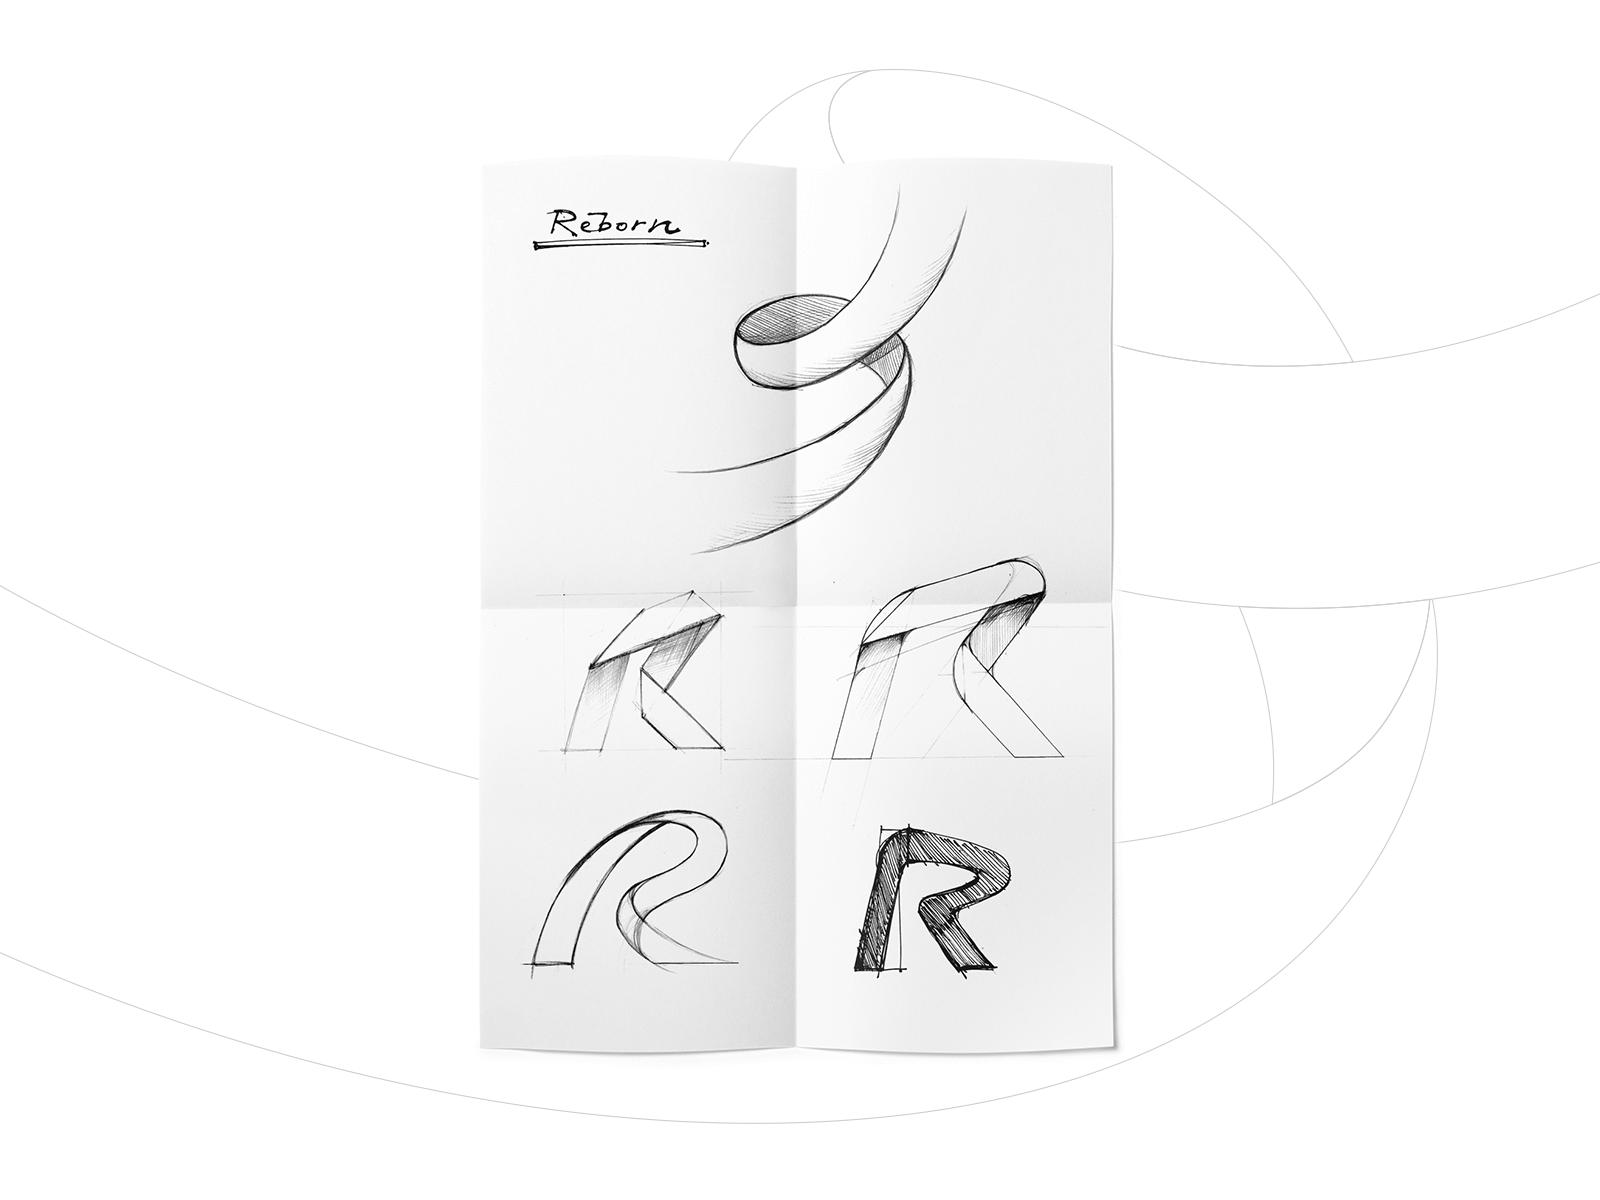 Reborn_sketches case study